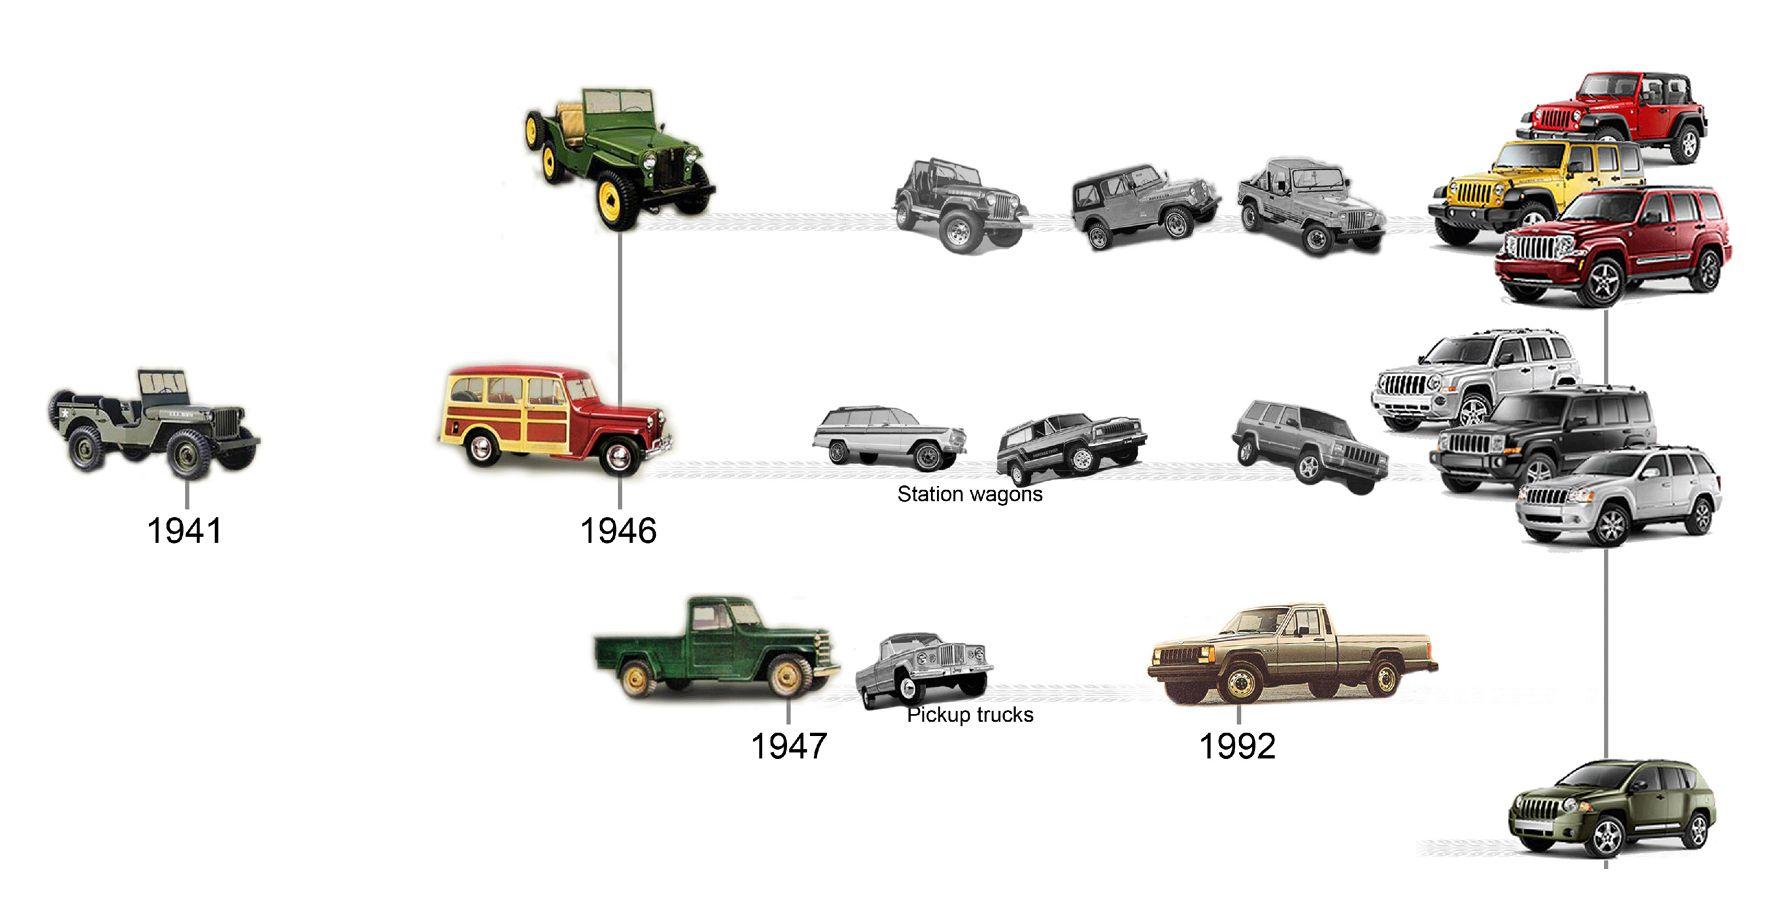 Jeep wrangler timeline